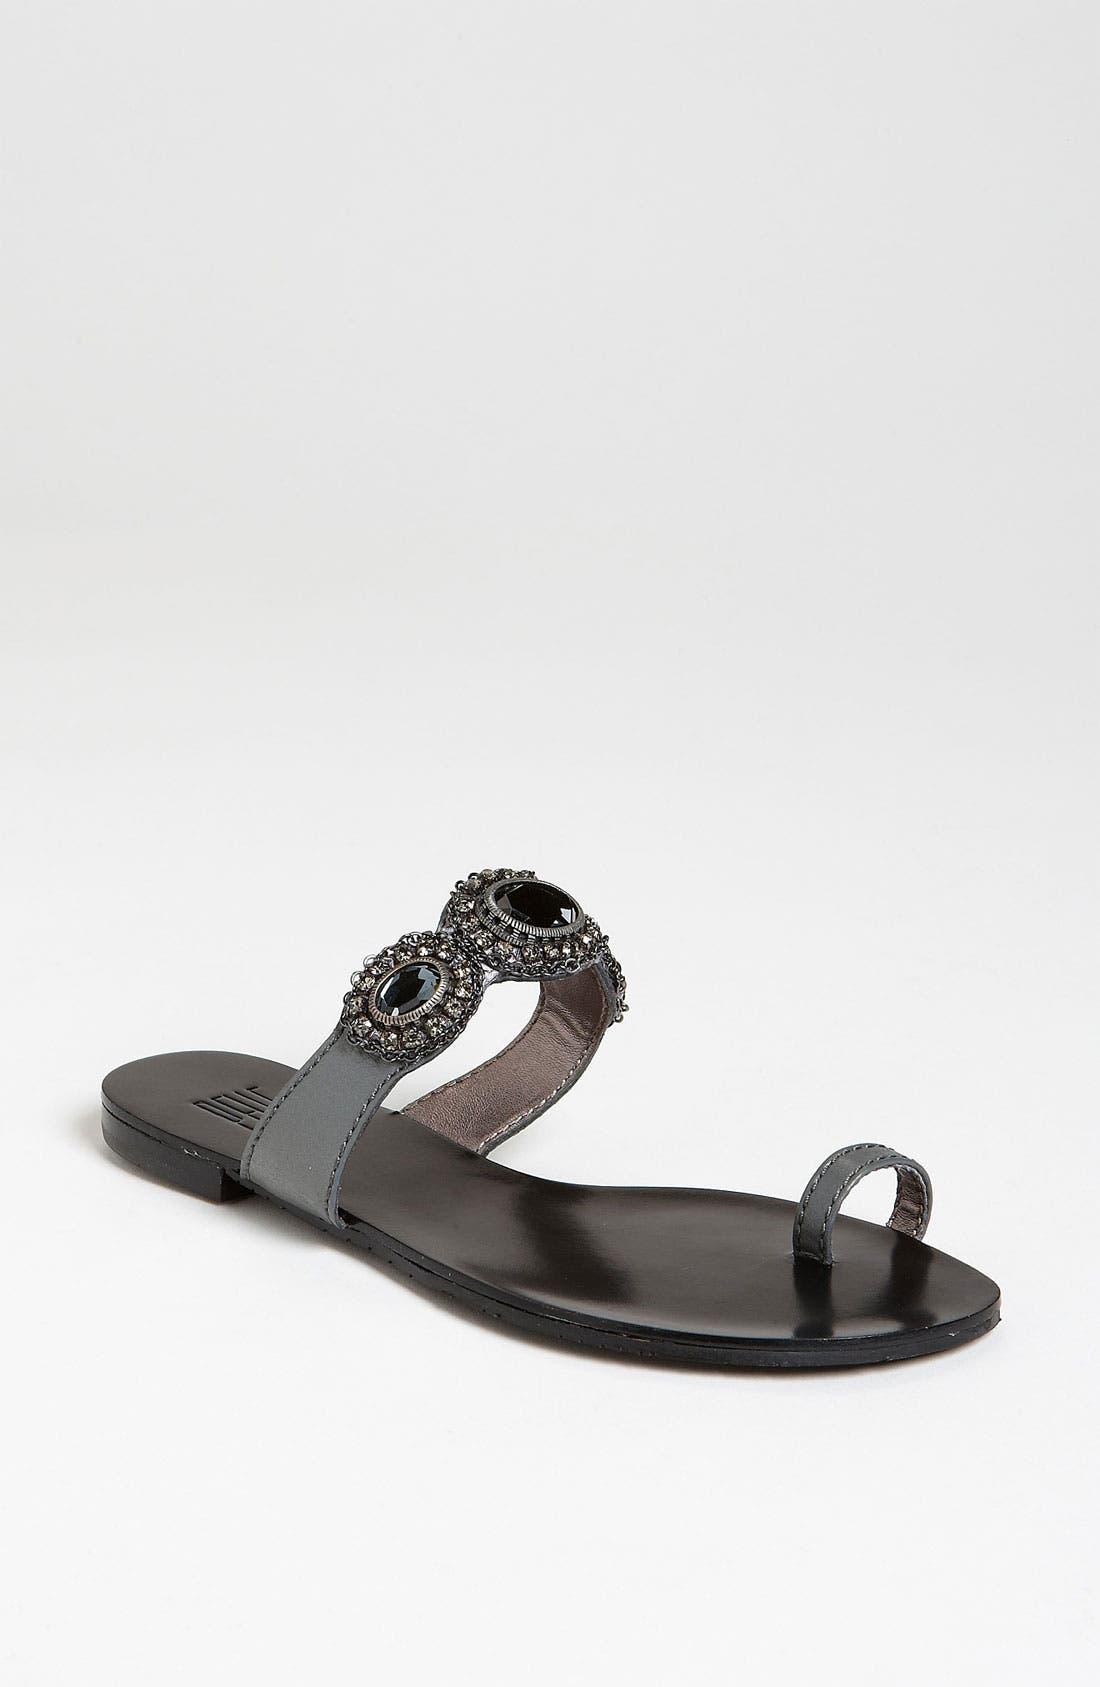 Main Image - Pelle Moda 'Hilda' Sandal